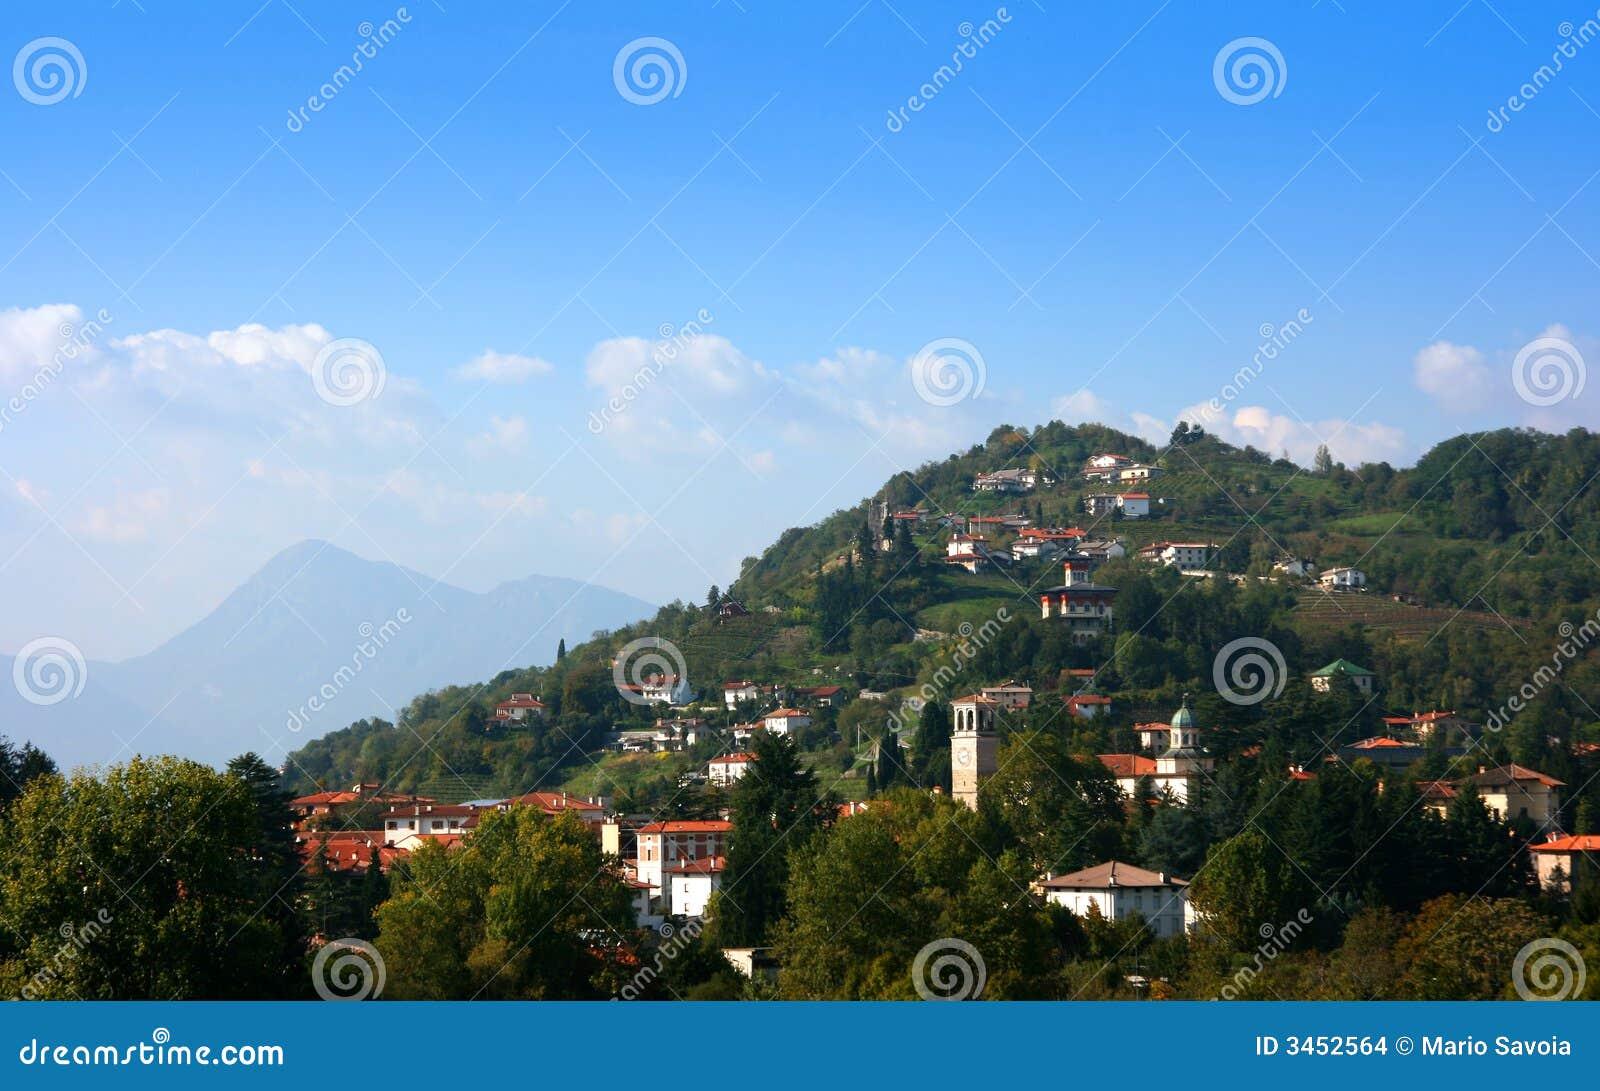 Häuser auf dem Hügel